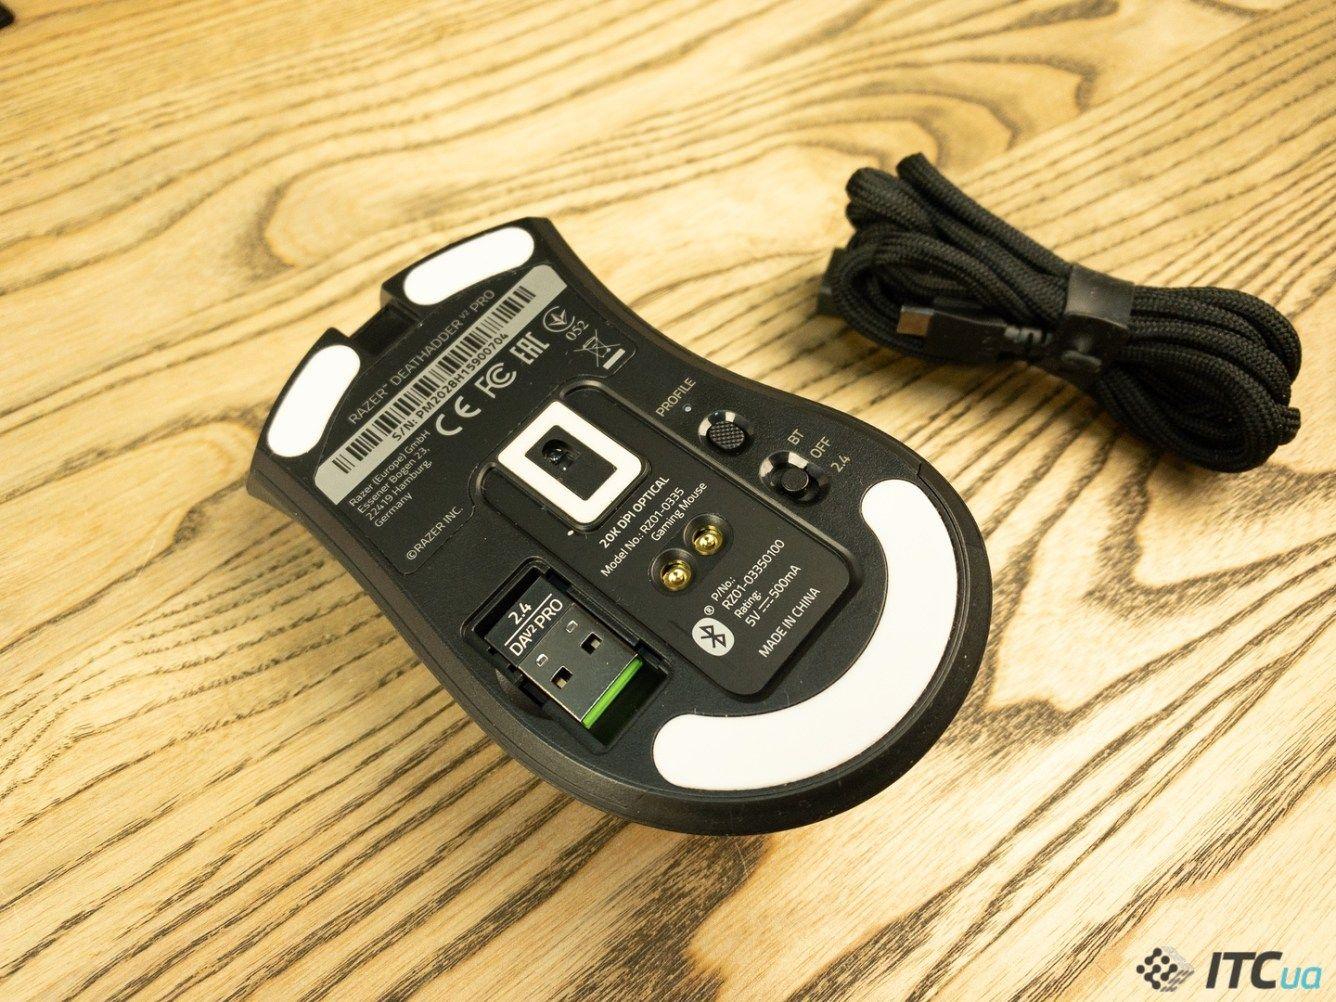 Мышка Razer DeathAdder V2 Pro. Фото 7